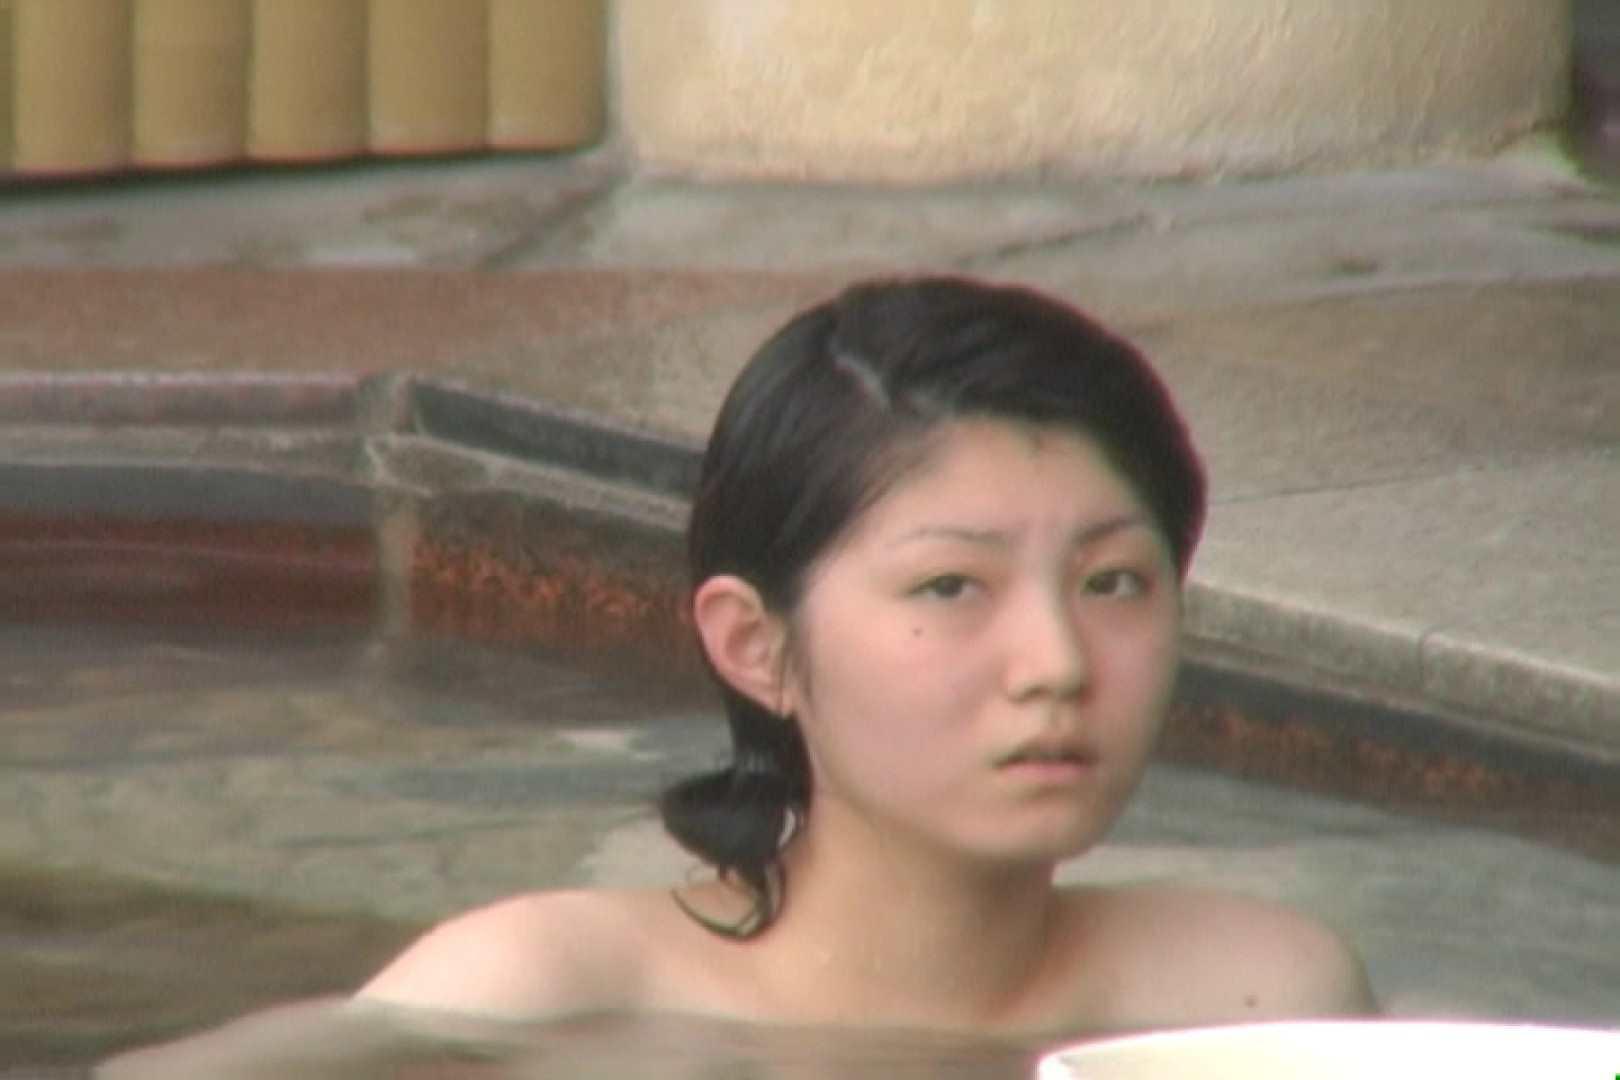 Aquaな露天風呂Vol.579 露天   OLセックス  52画像 46